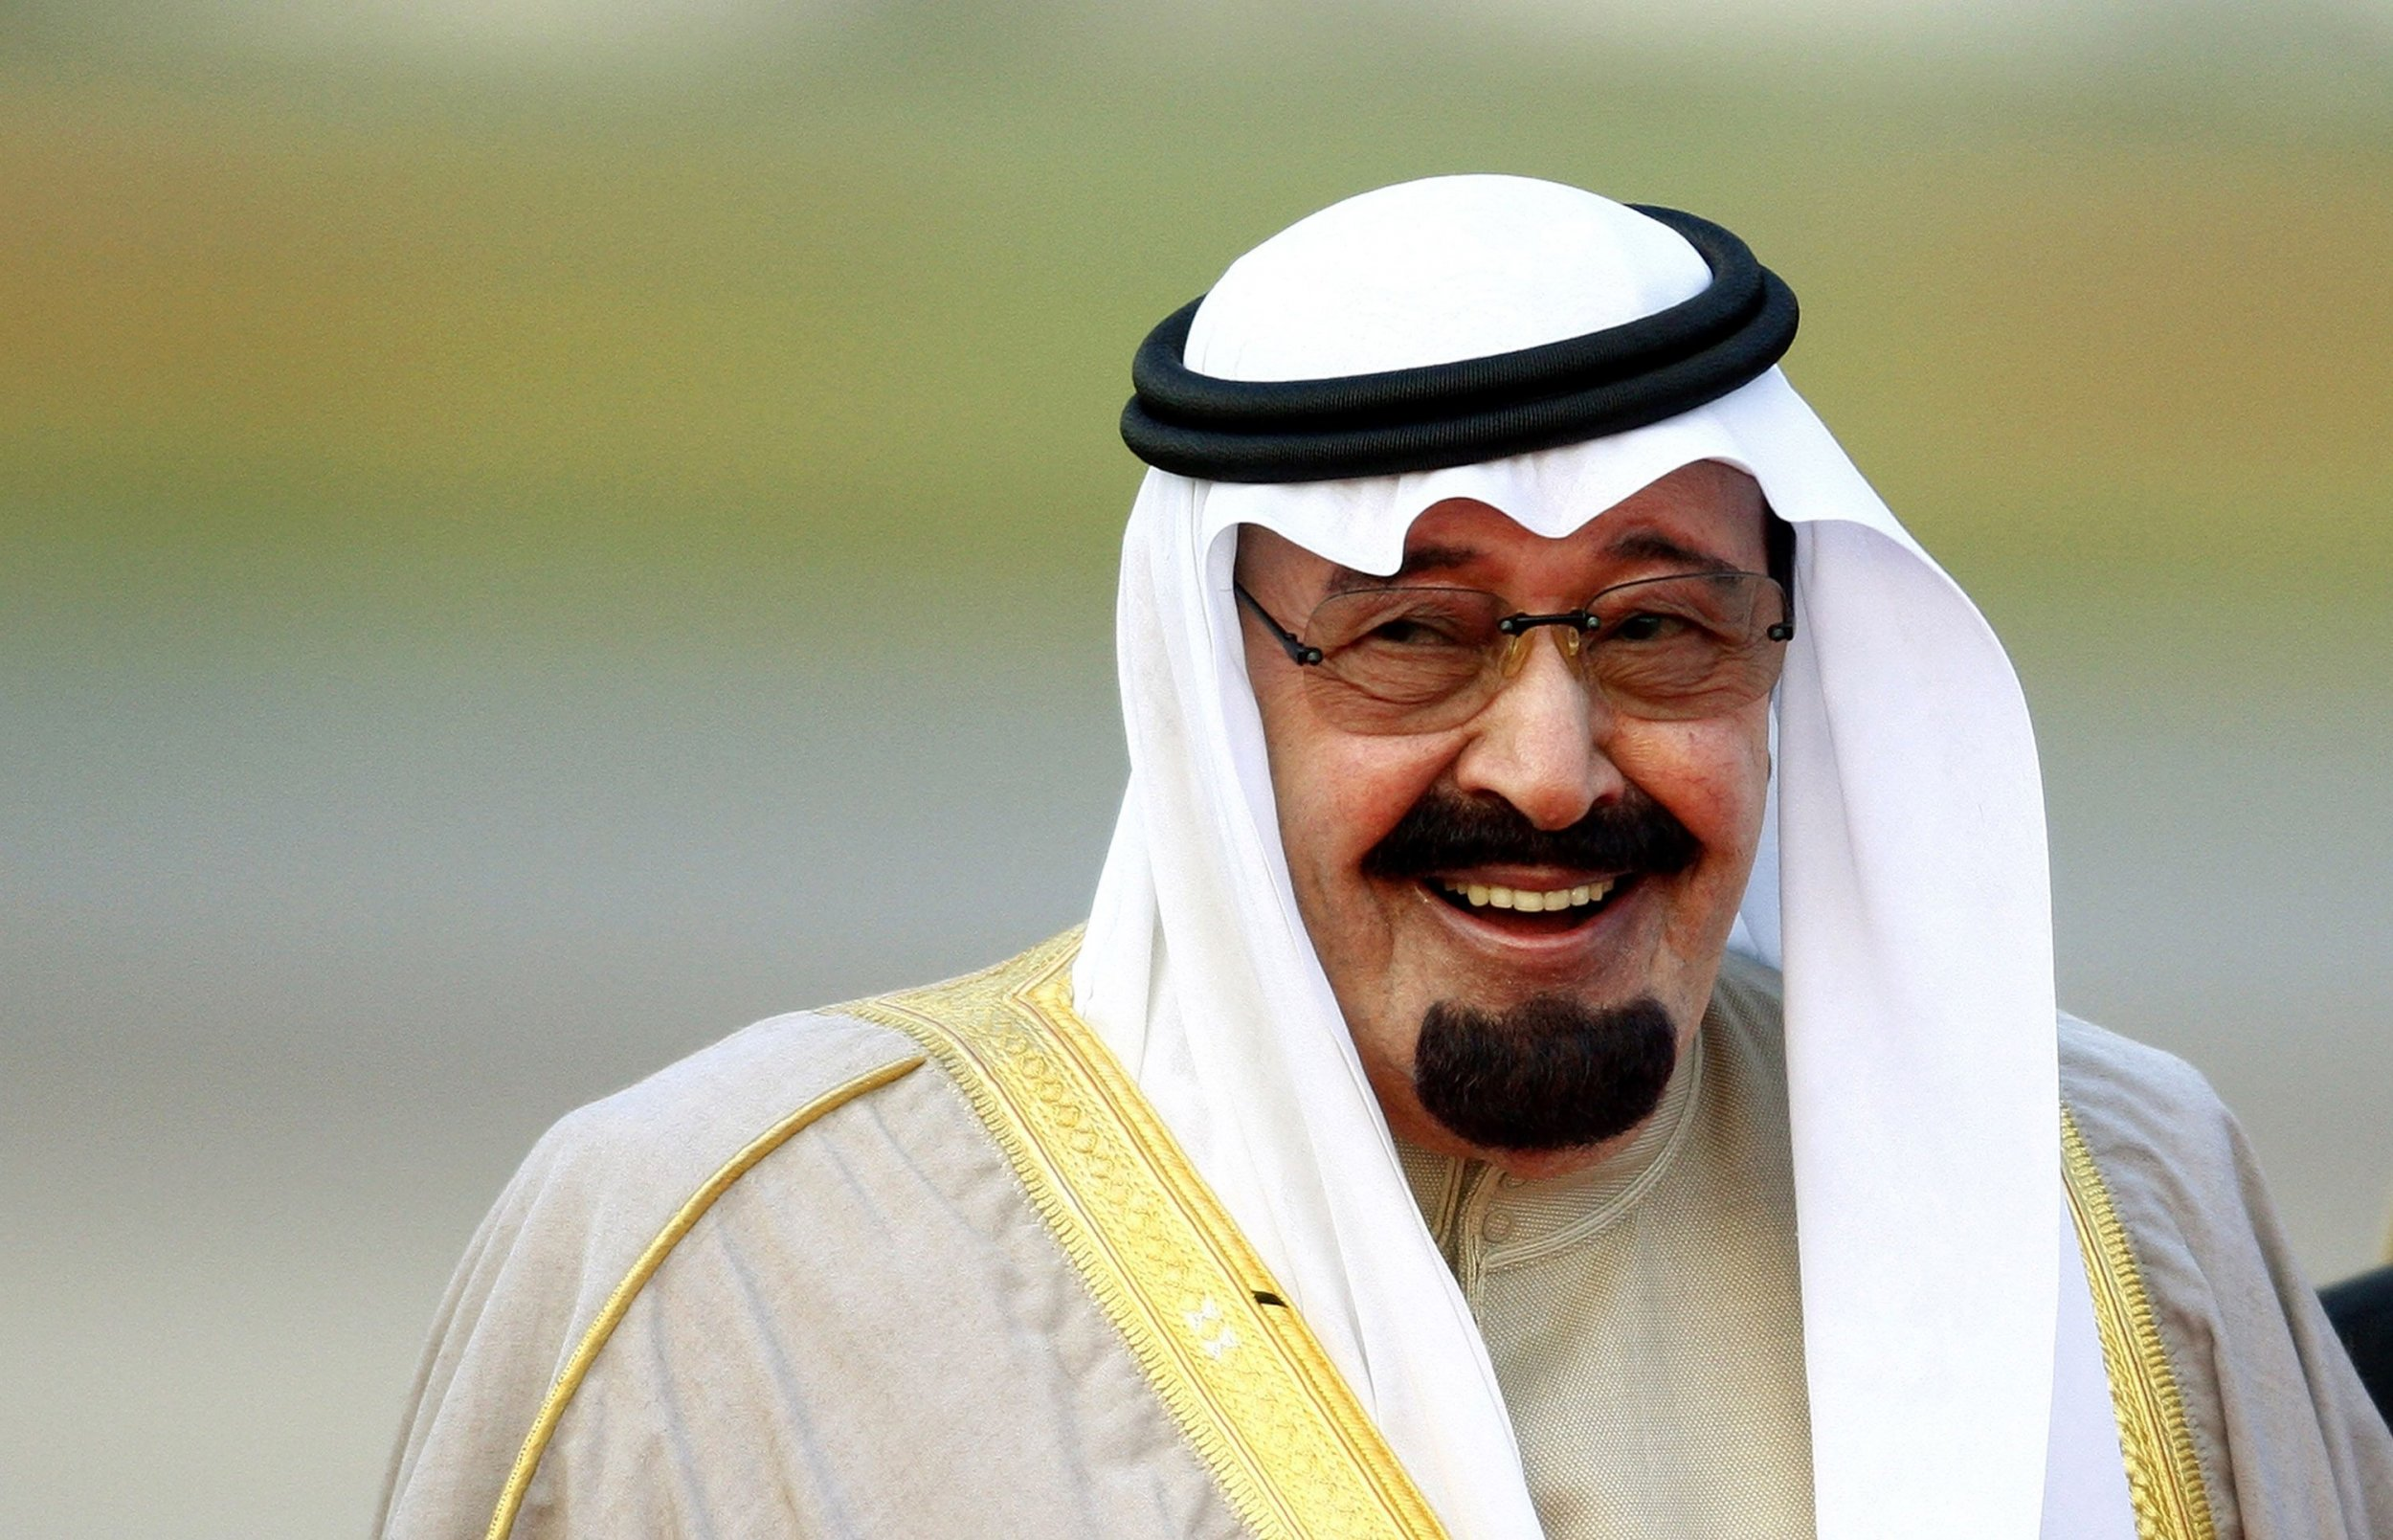 Saudi Arabia's King Abdullah bin Abdulaziz